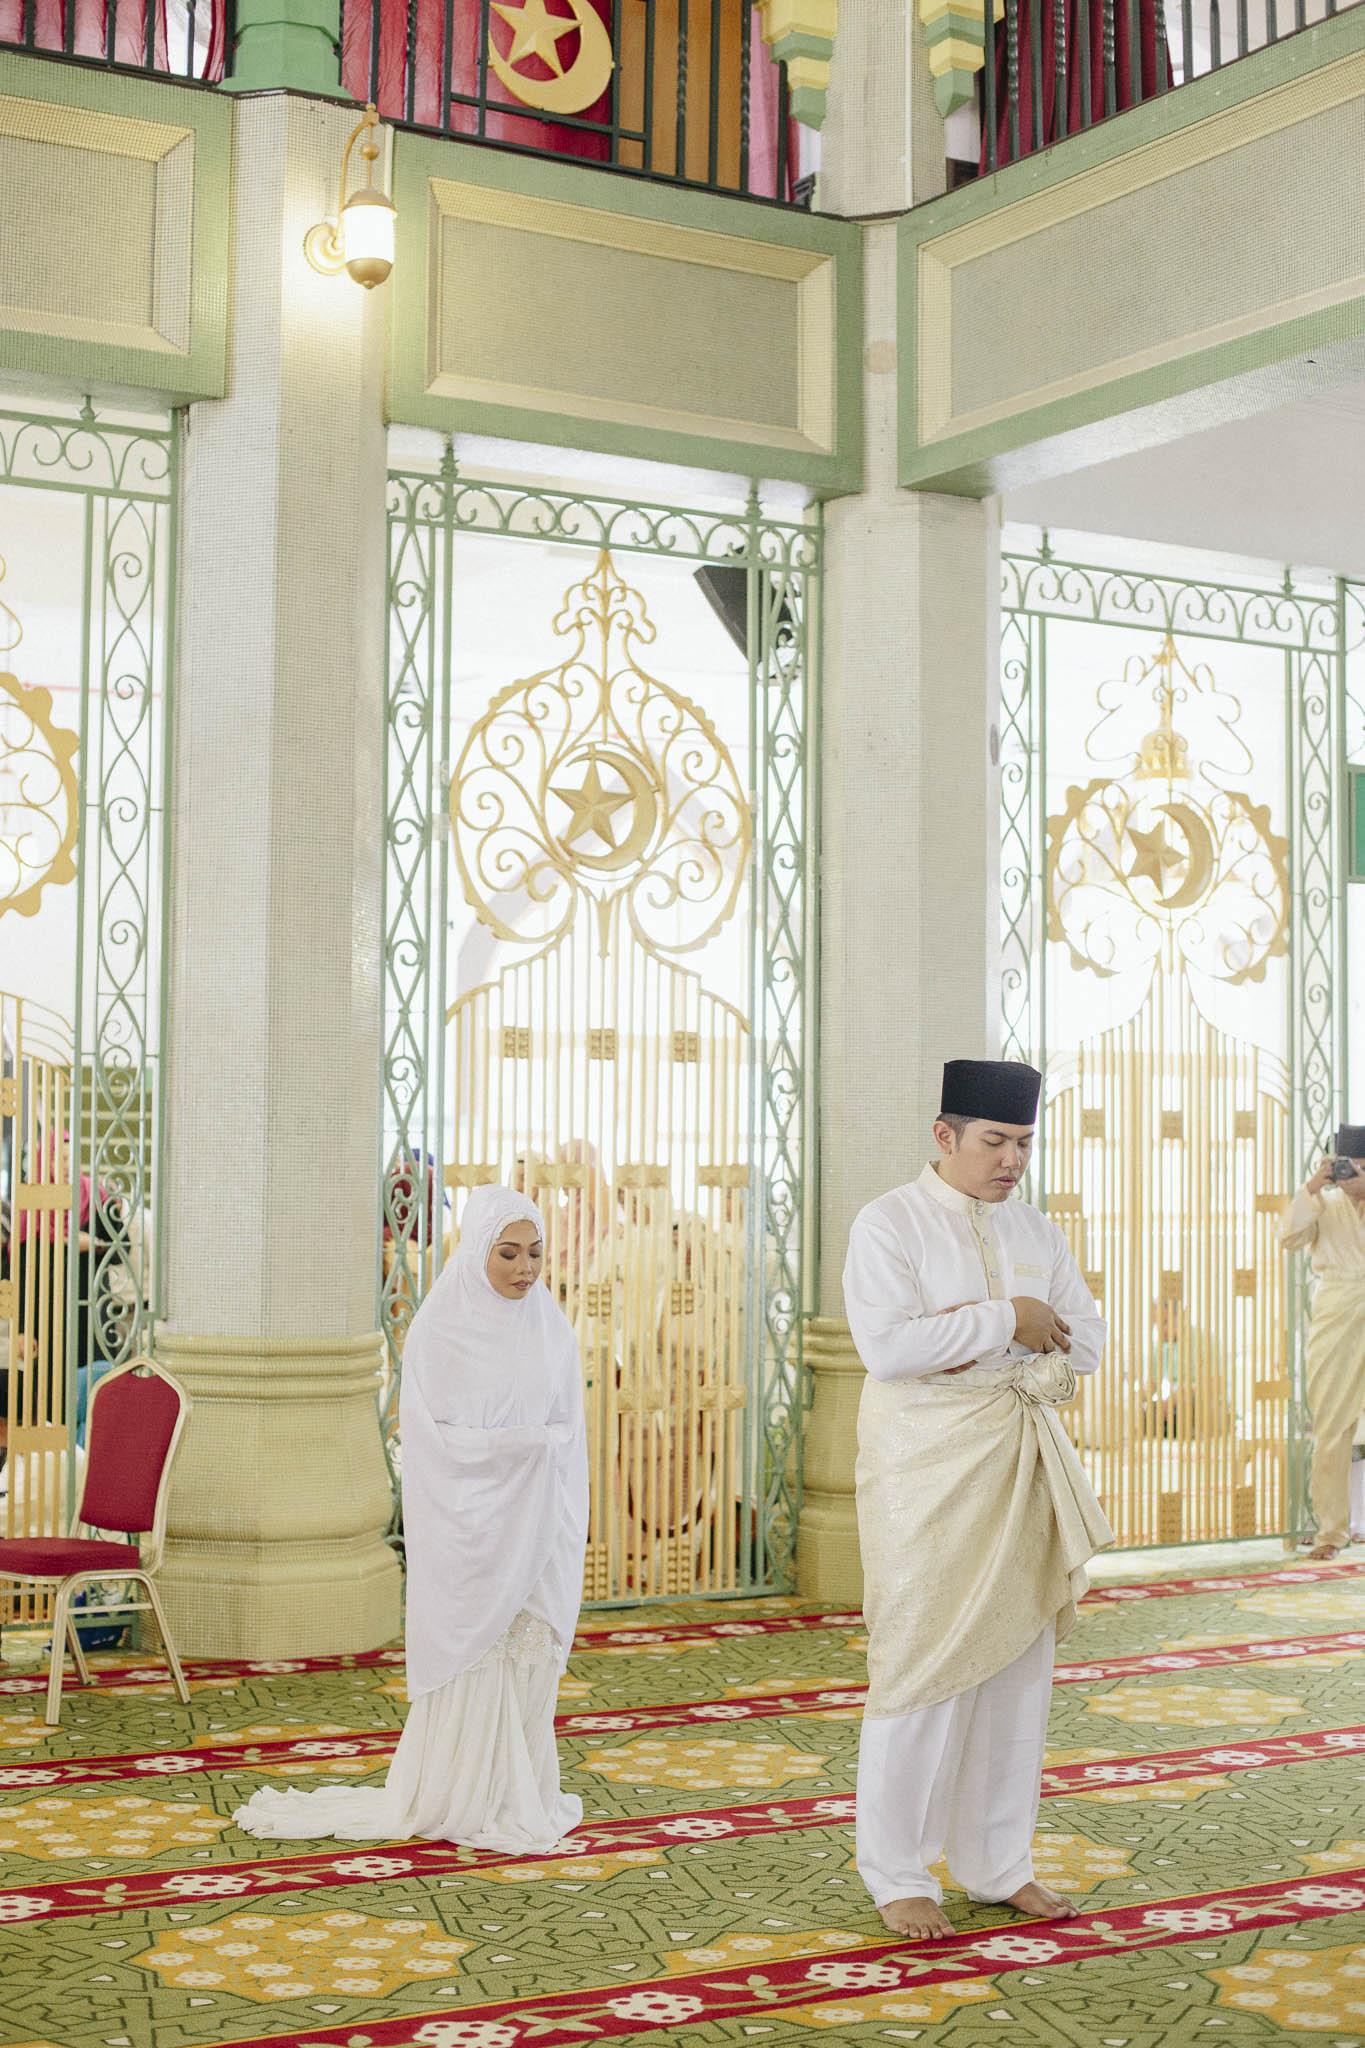 singapore-wedding-photographer-travel-khairul-atikah-24.jpg